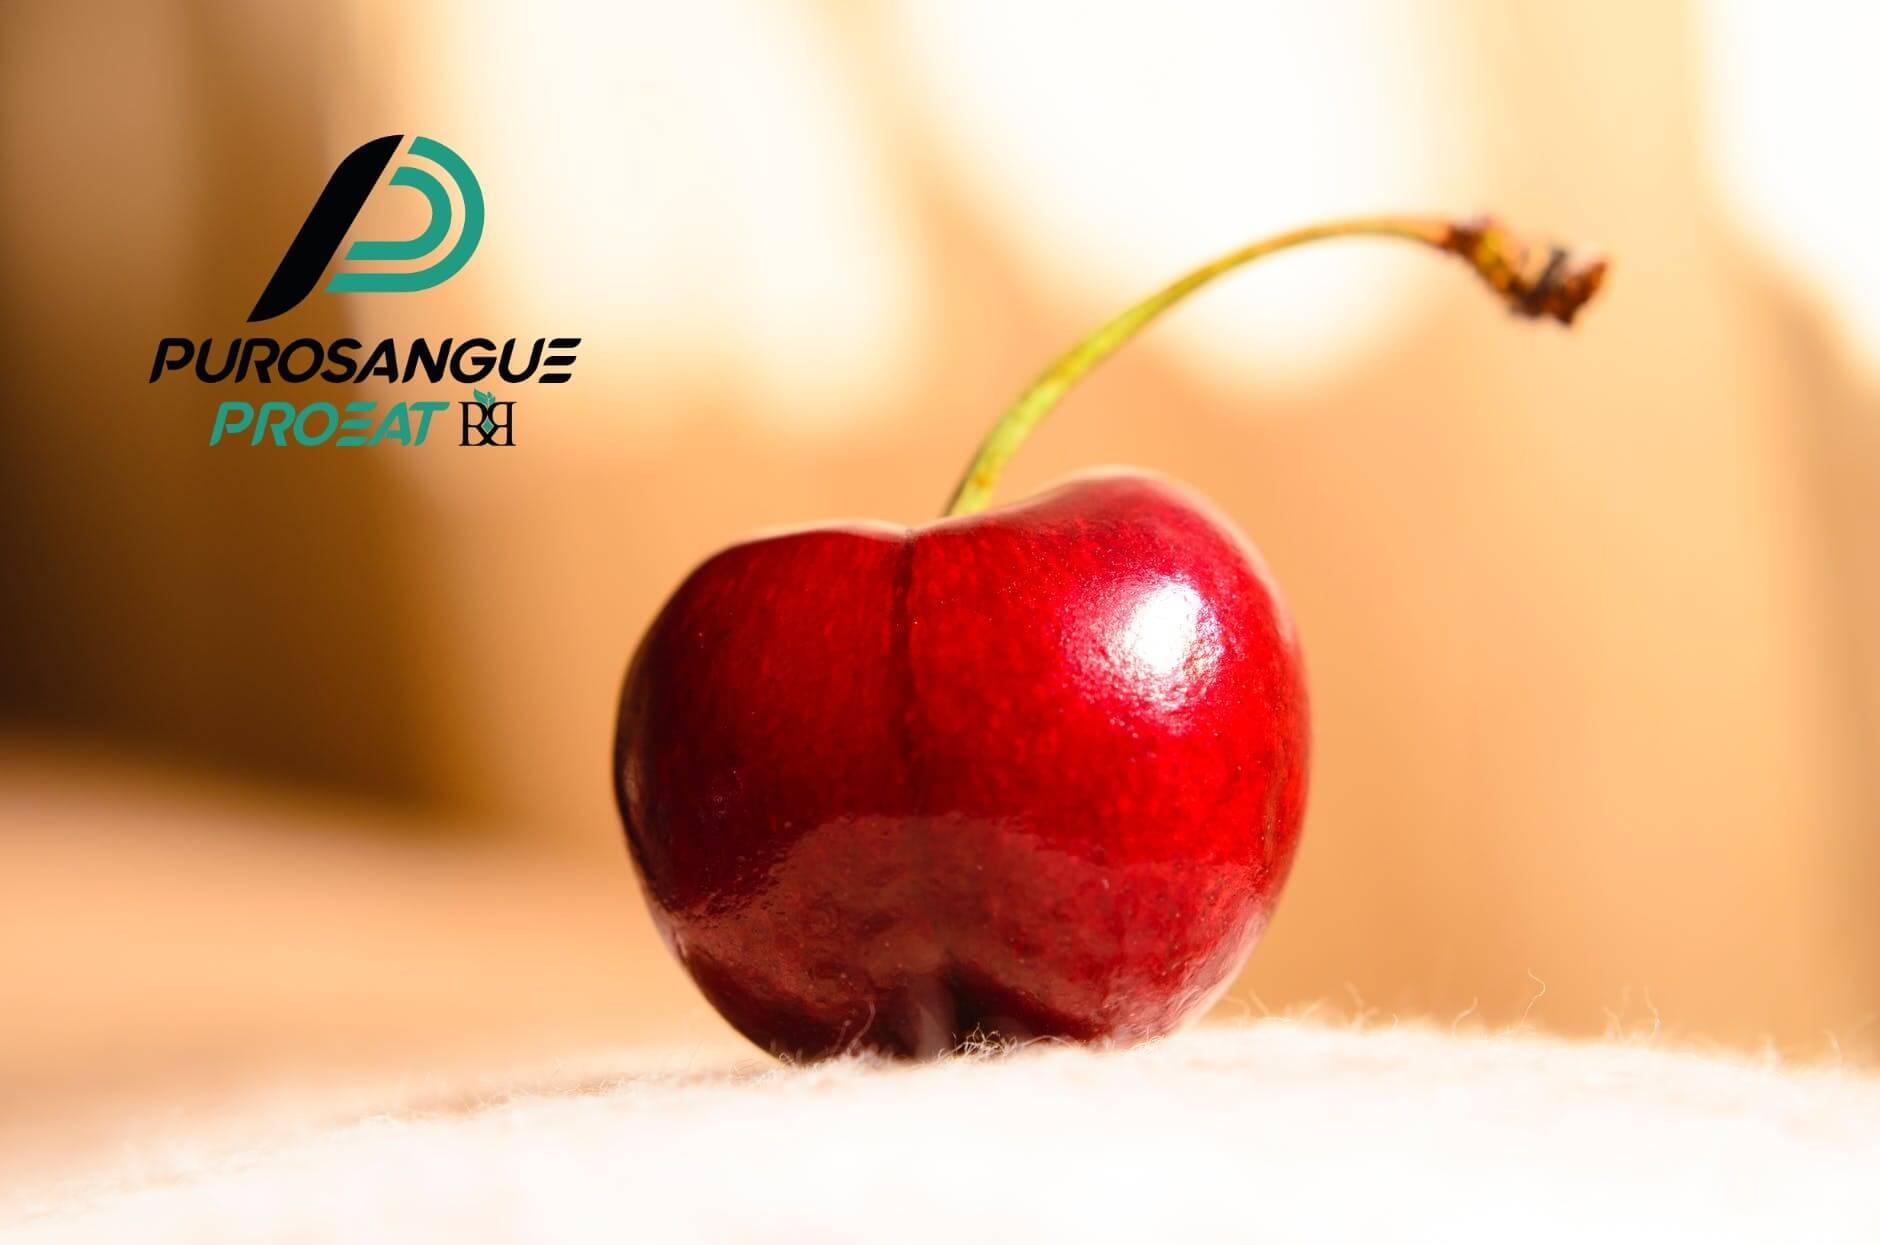 La ciliegia, elisir per i runners